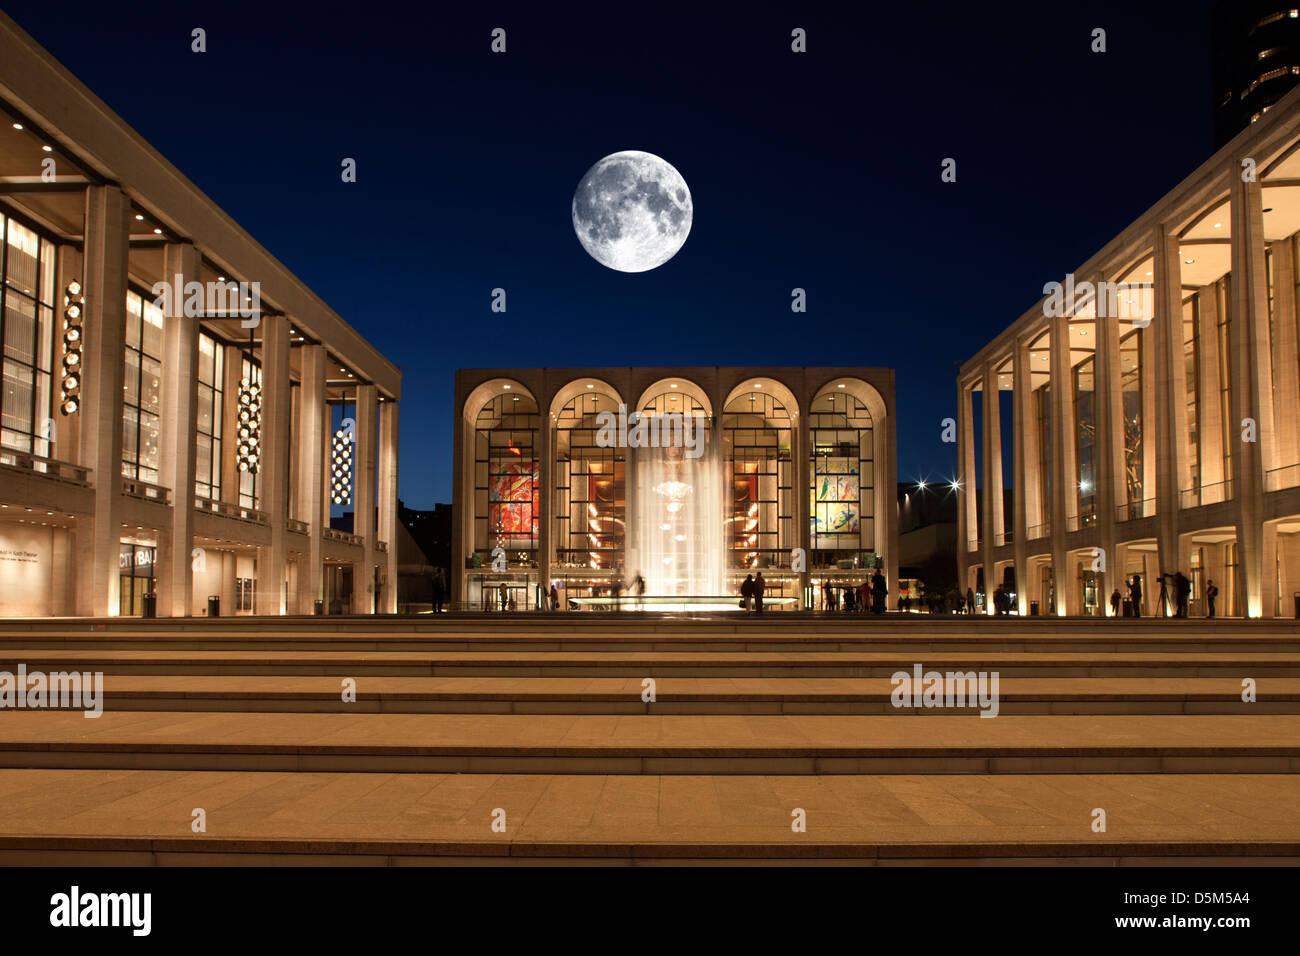 METROPOLITAN OPERA HOUSE (©WALLACE HARRISON 1966) MAIN PLAZA LINCOLN CENTER MANHATTAN NEW YORK CITY USA - Stock Image